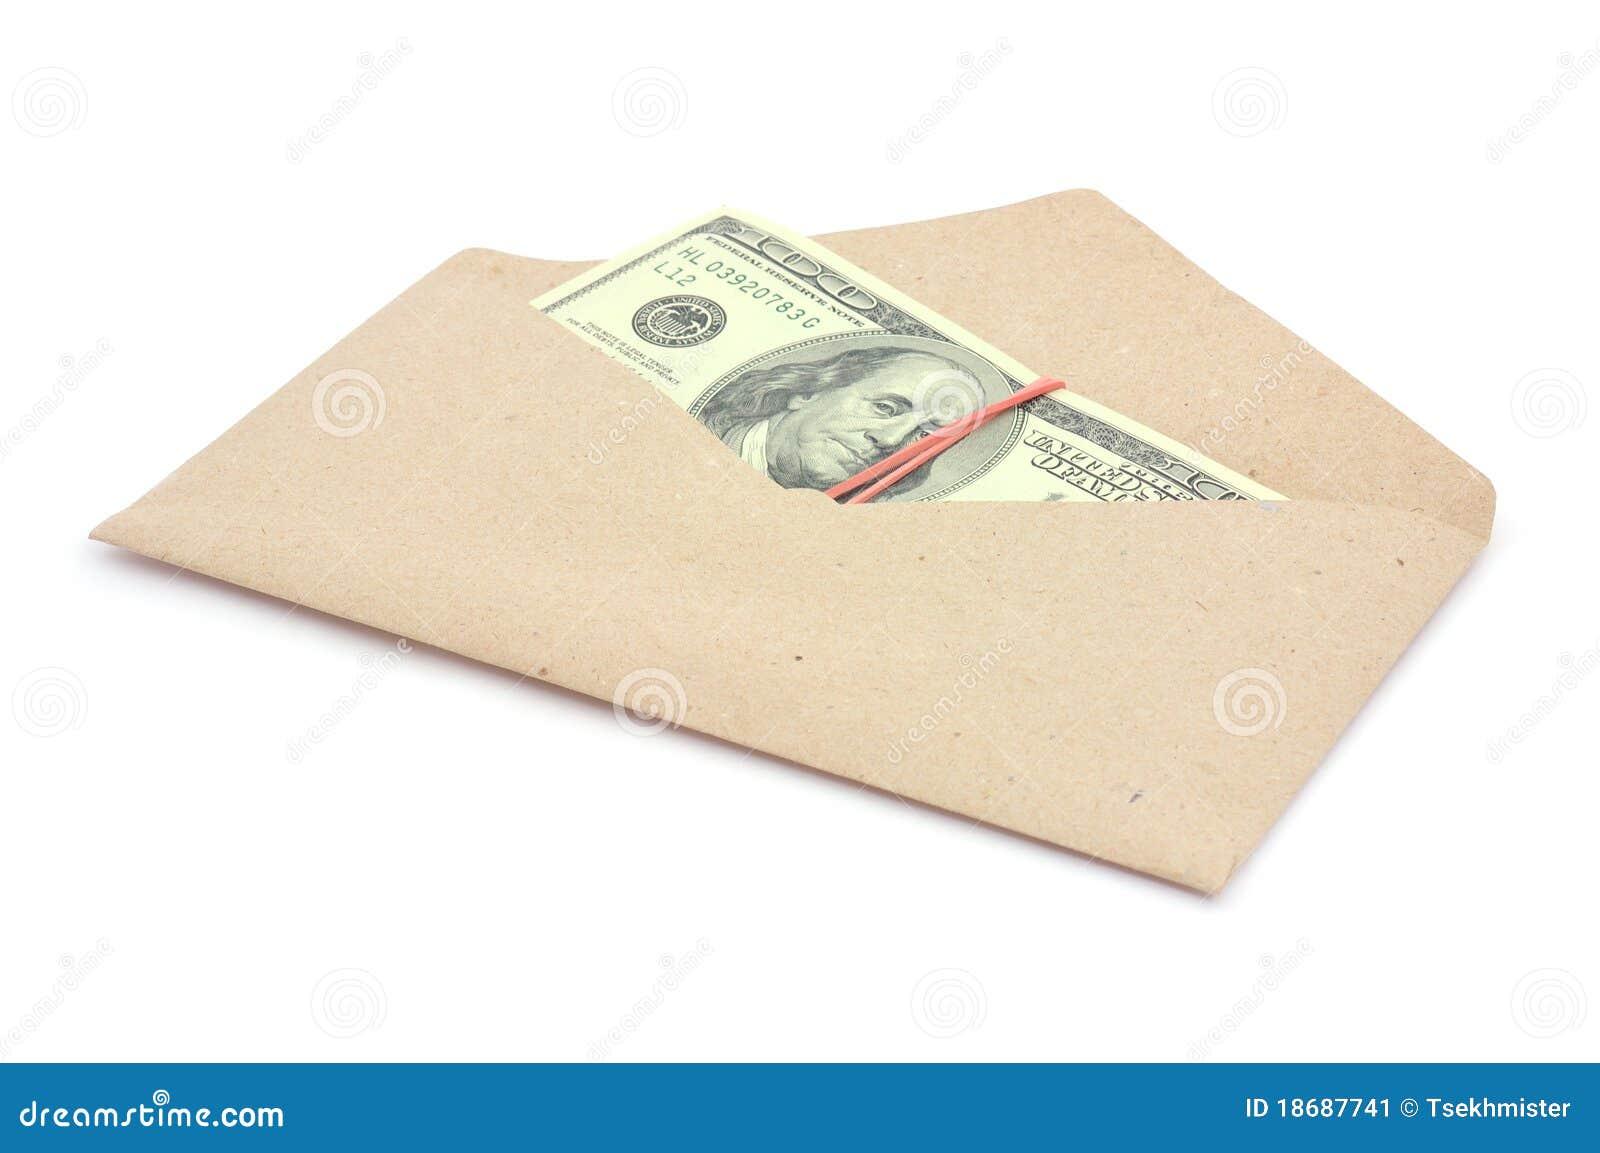 Money In Envelope Stock Image - Image: 18687741